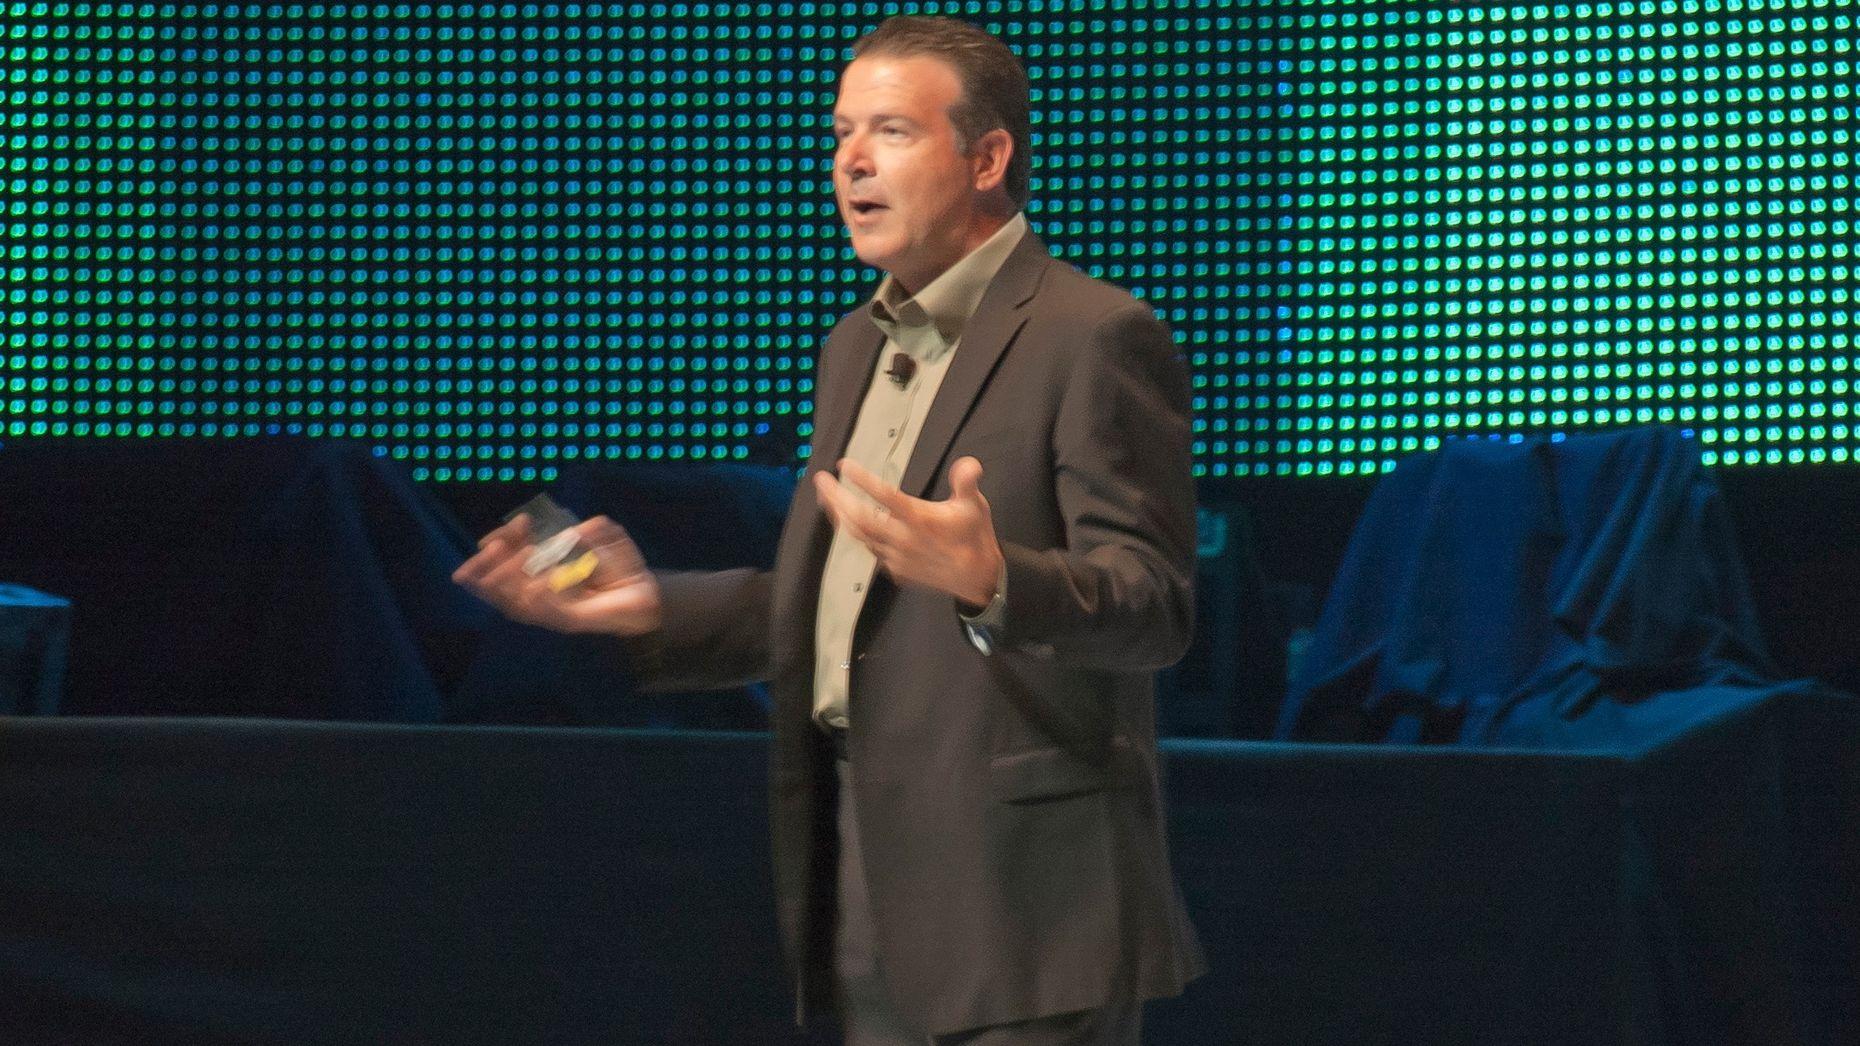 Salesforce's Tod Nielsen. Photo by Flickr/Luke Kilpatrick.